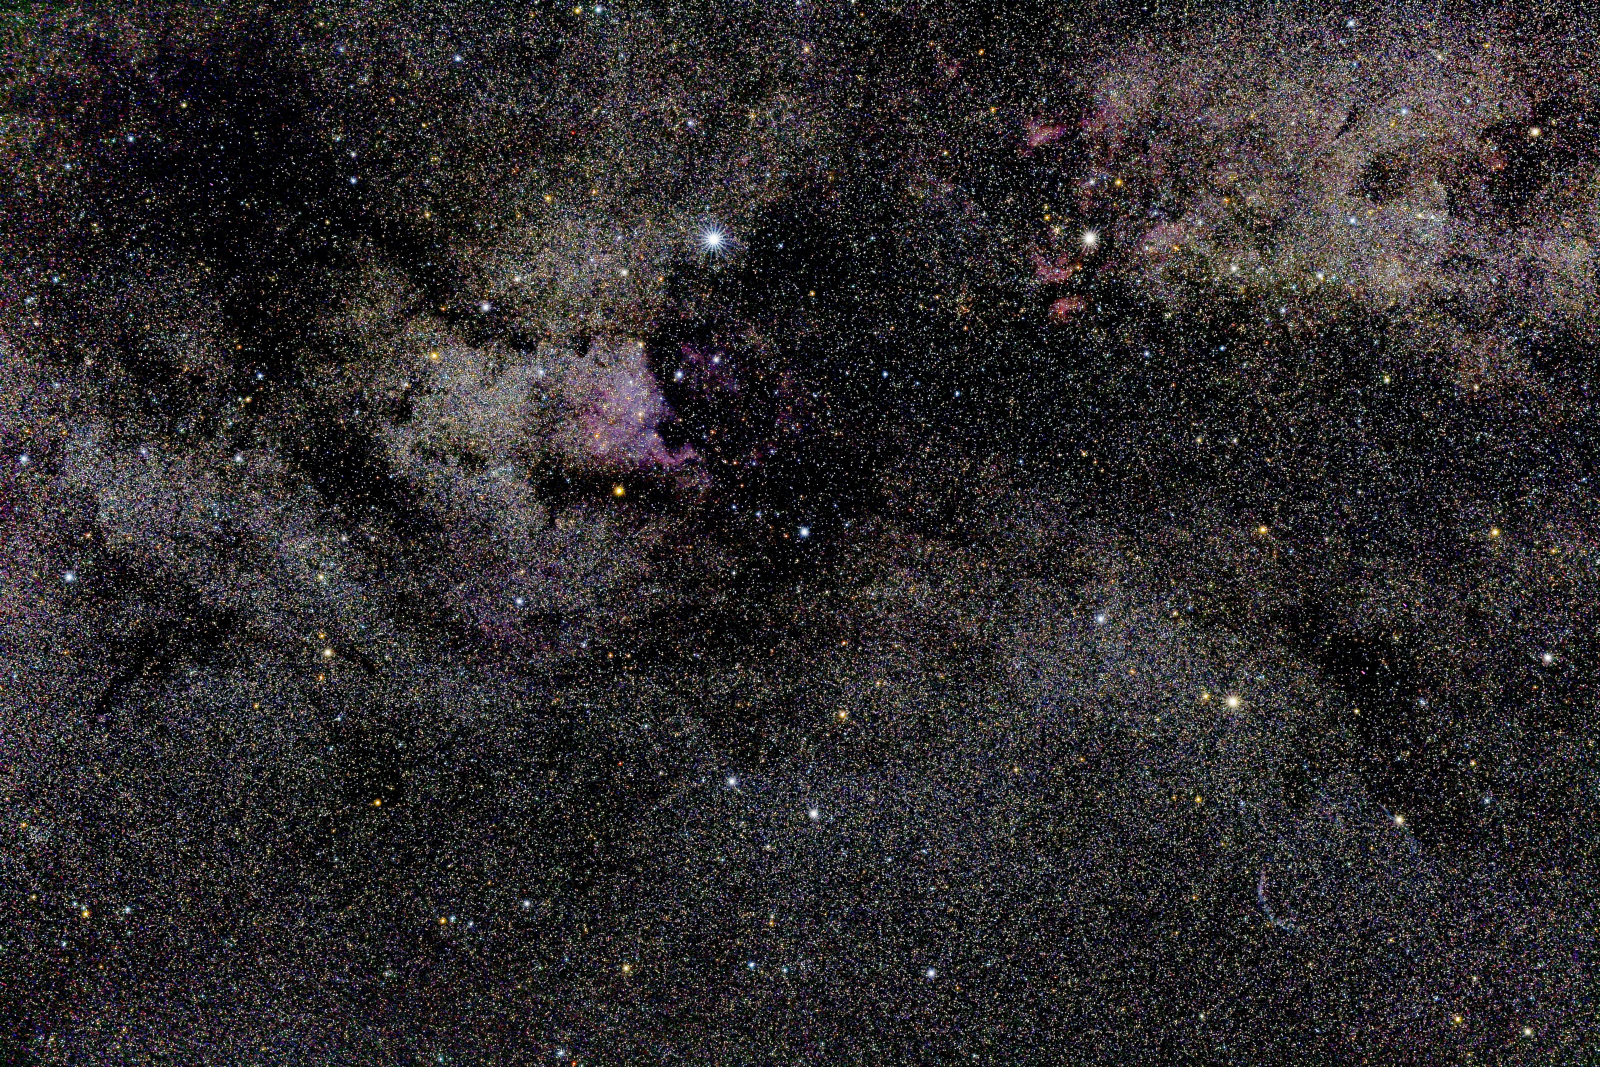 cygnus3_PIX.thumb.jpg.f85b23a24031e33bb605f93b0e47e82d.jpg